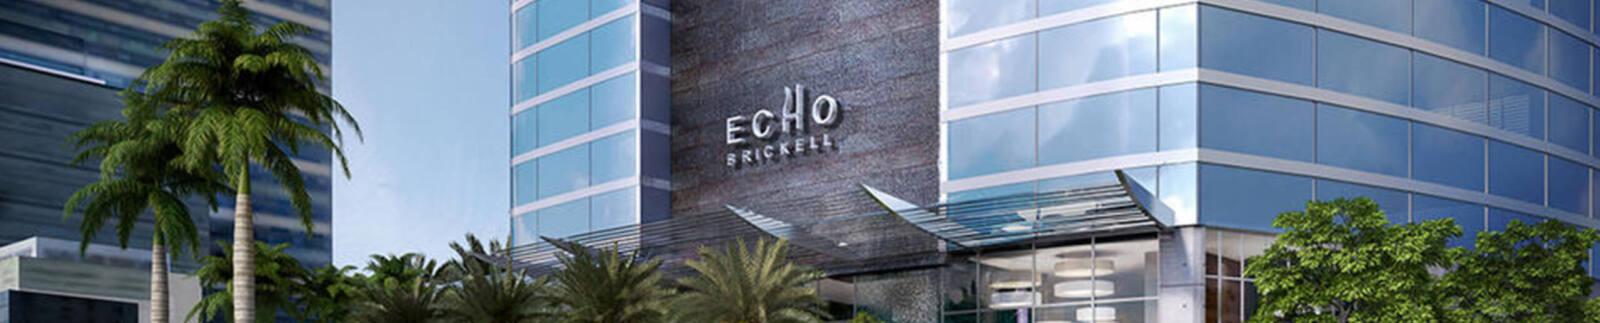 Echo Brickell Fire Sprinkler System Design